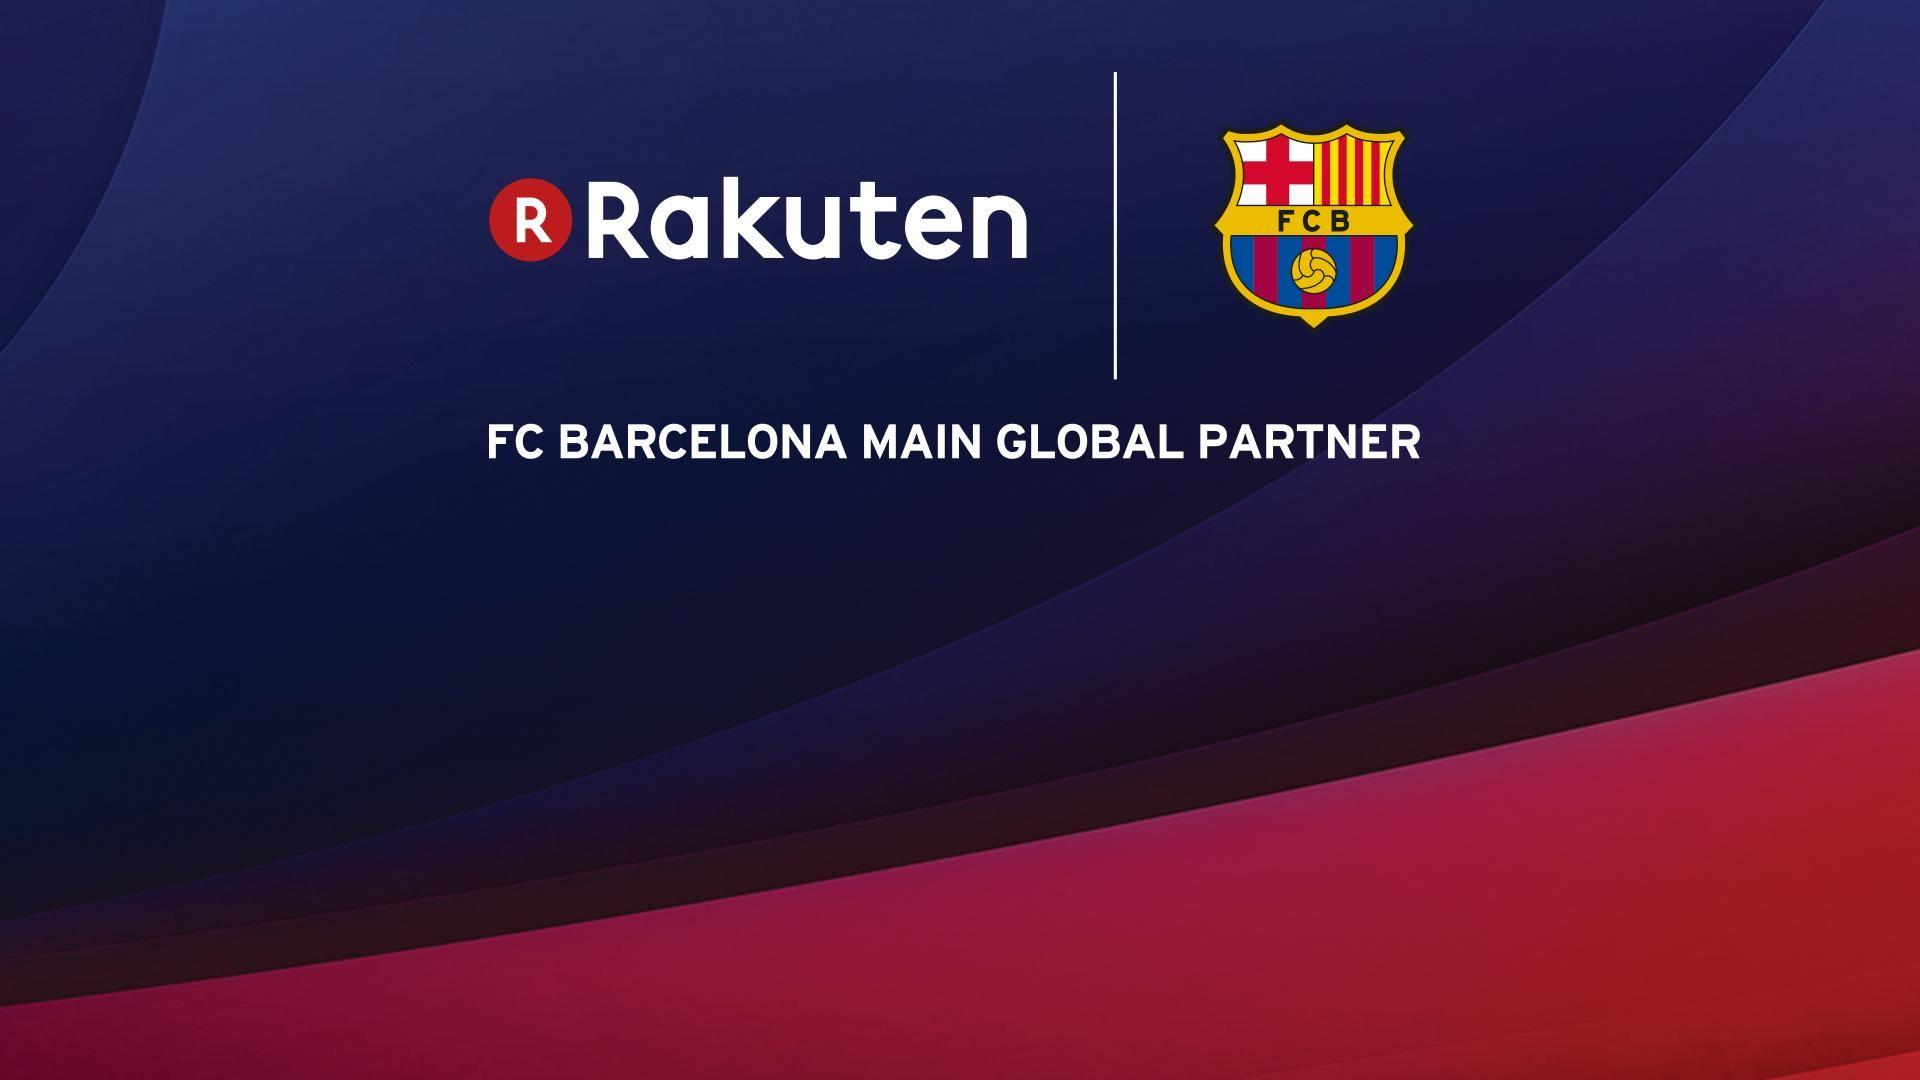 Rakuten x FC Barcelone (football) 2020